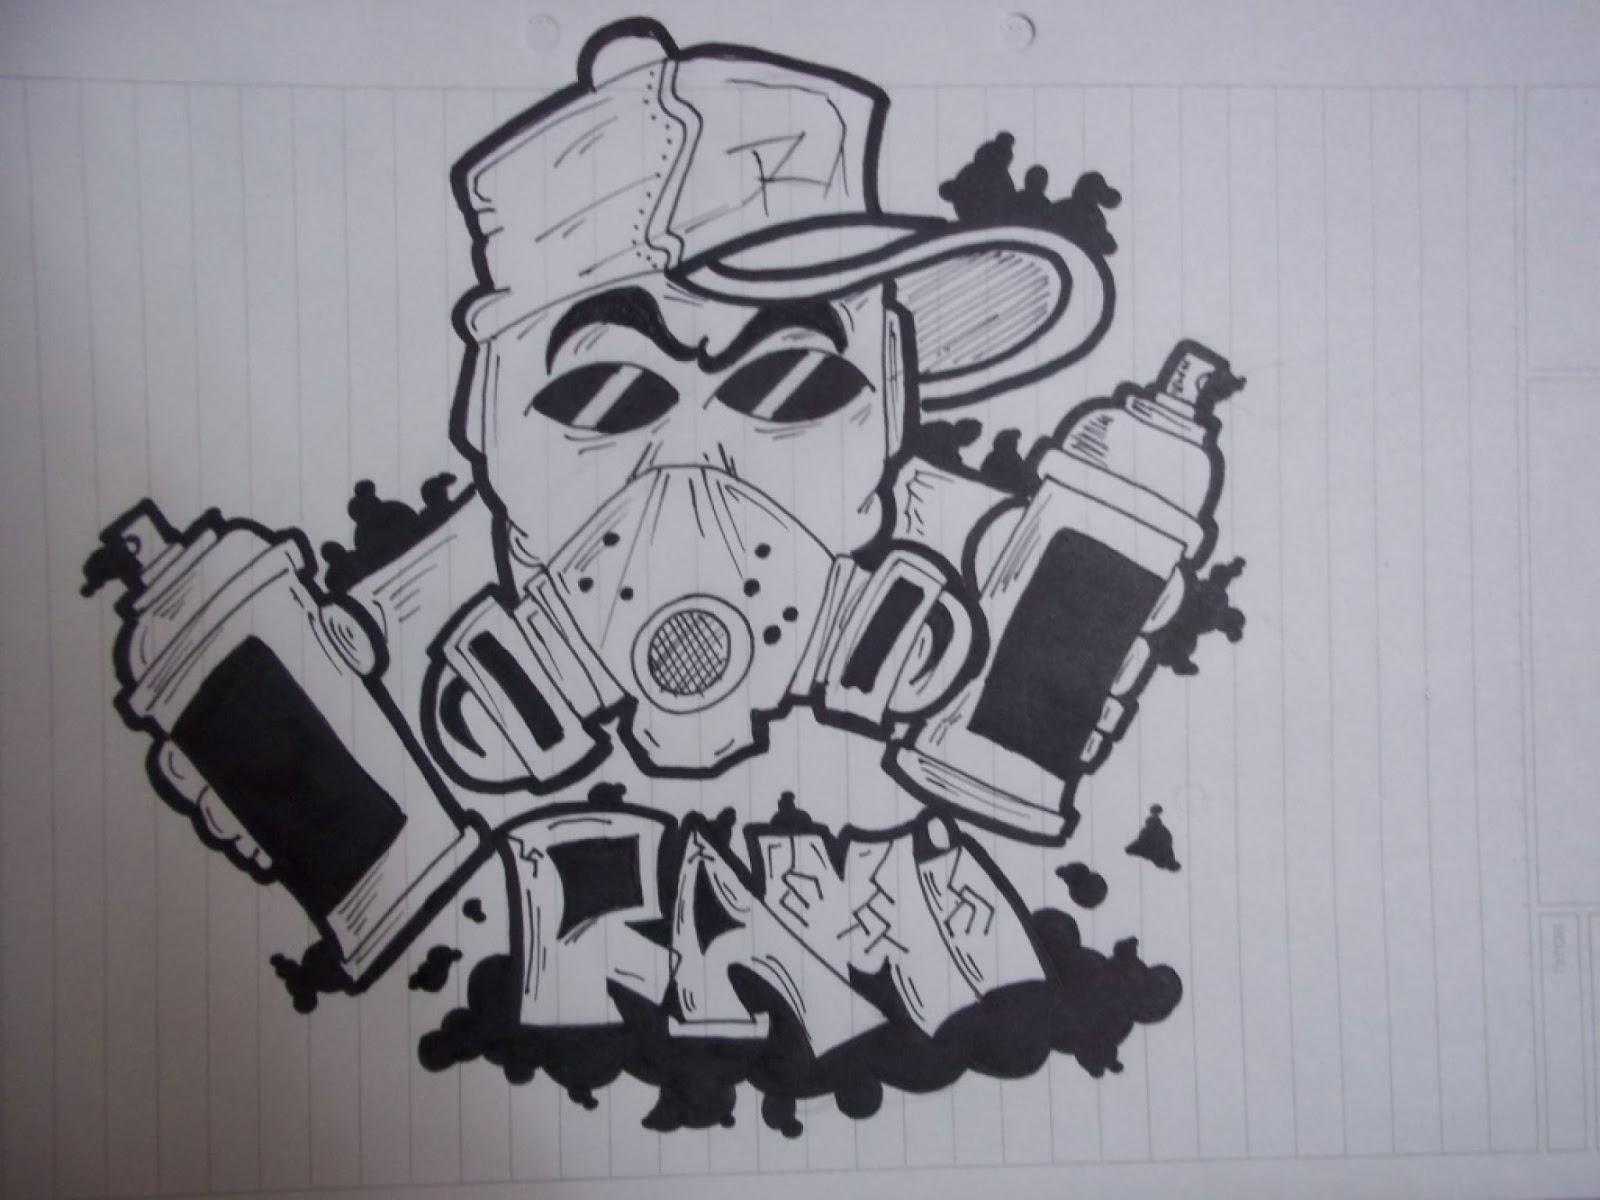 Imagenes De Dibujos Graffitis Fondos De Pantalla